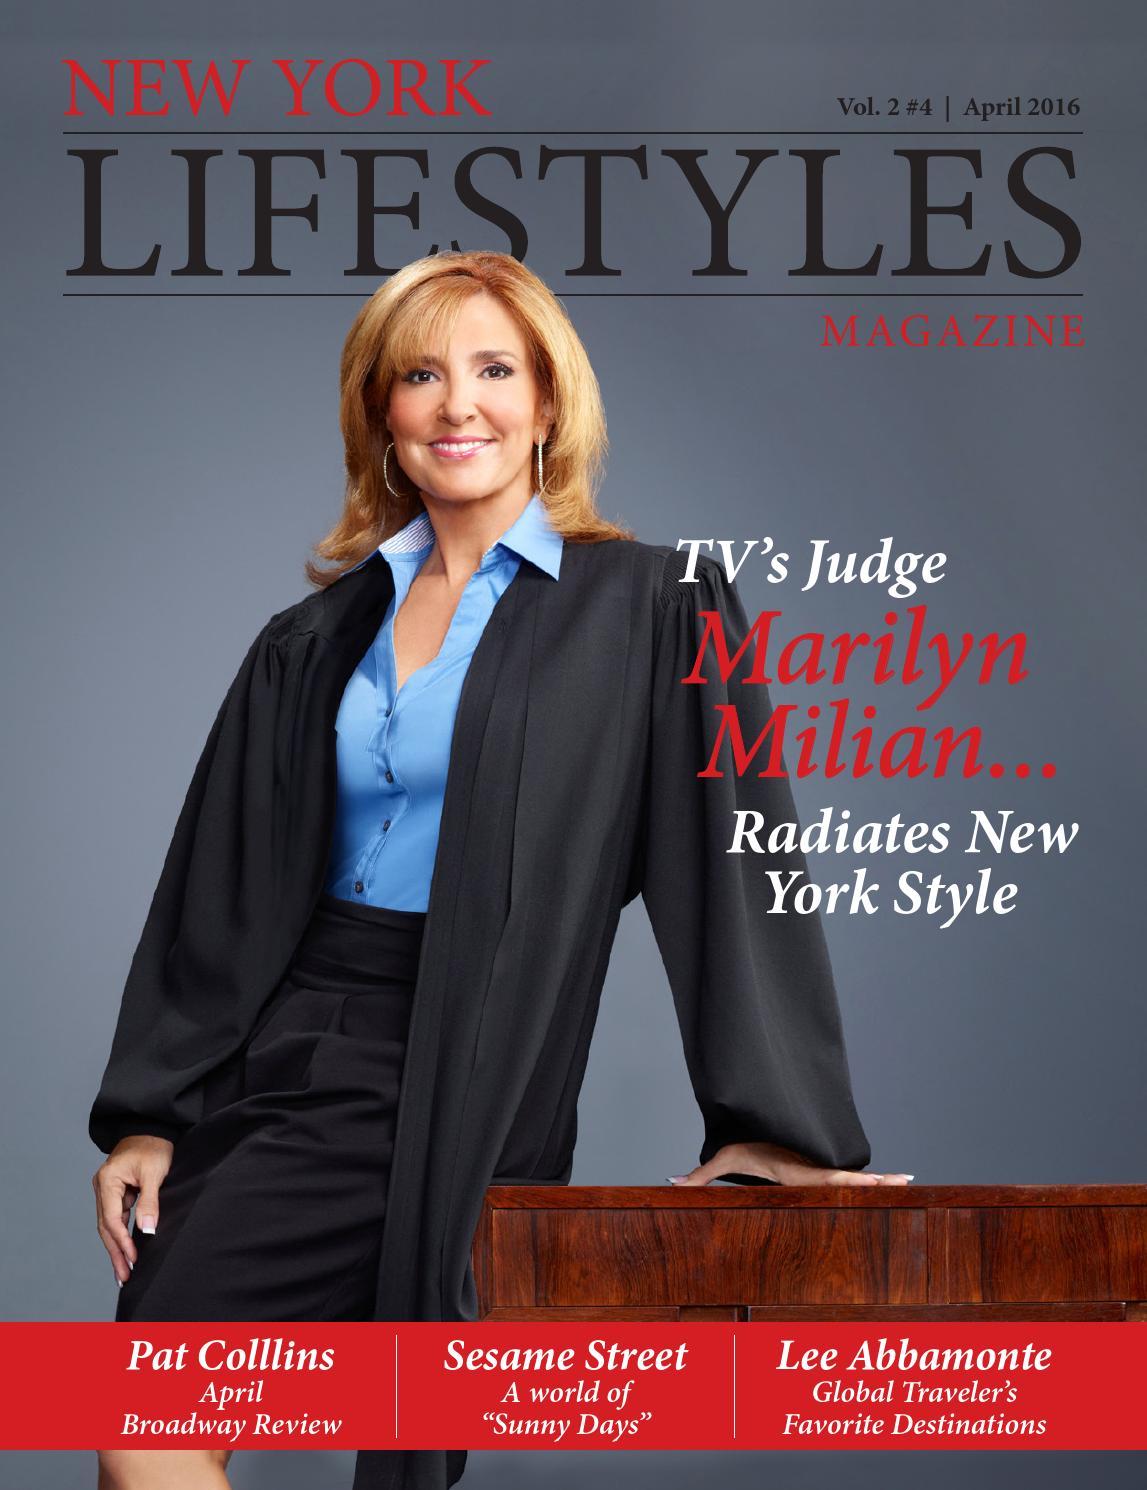 33c75fa6dadc0 New York Lifestyles Magazine - April 2016 by New York Lifestyles ...